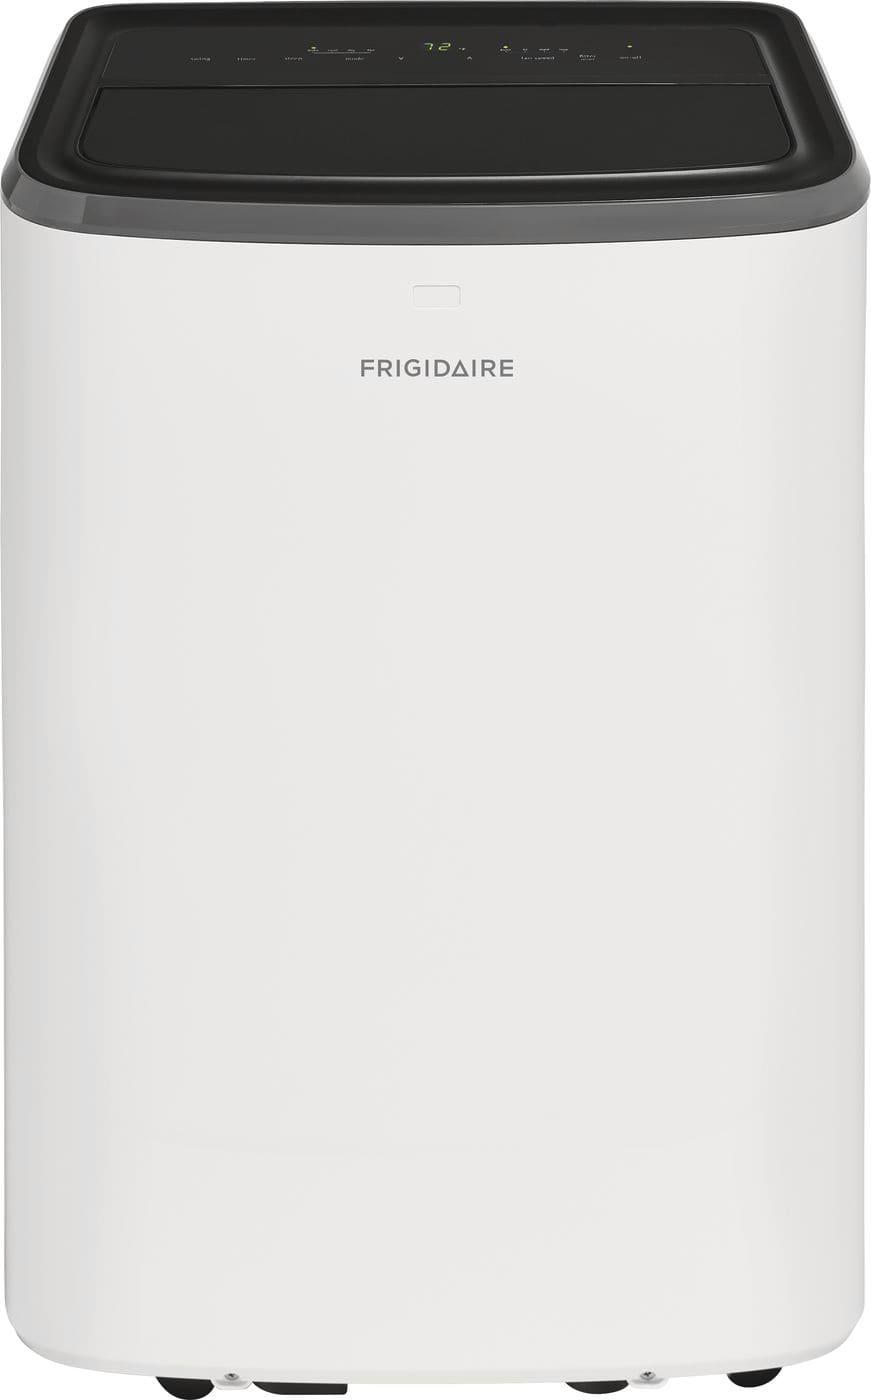 Model: FFPA0822U1 | Frigidaire 8,000 BTU Portable Room Air Conditioner